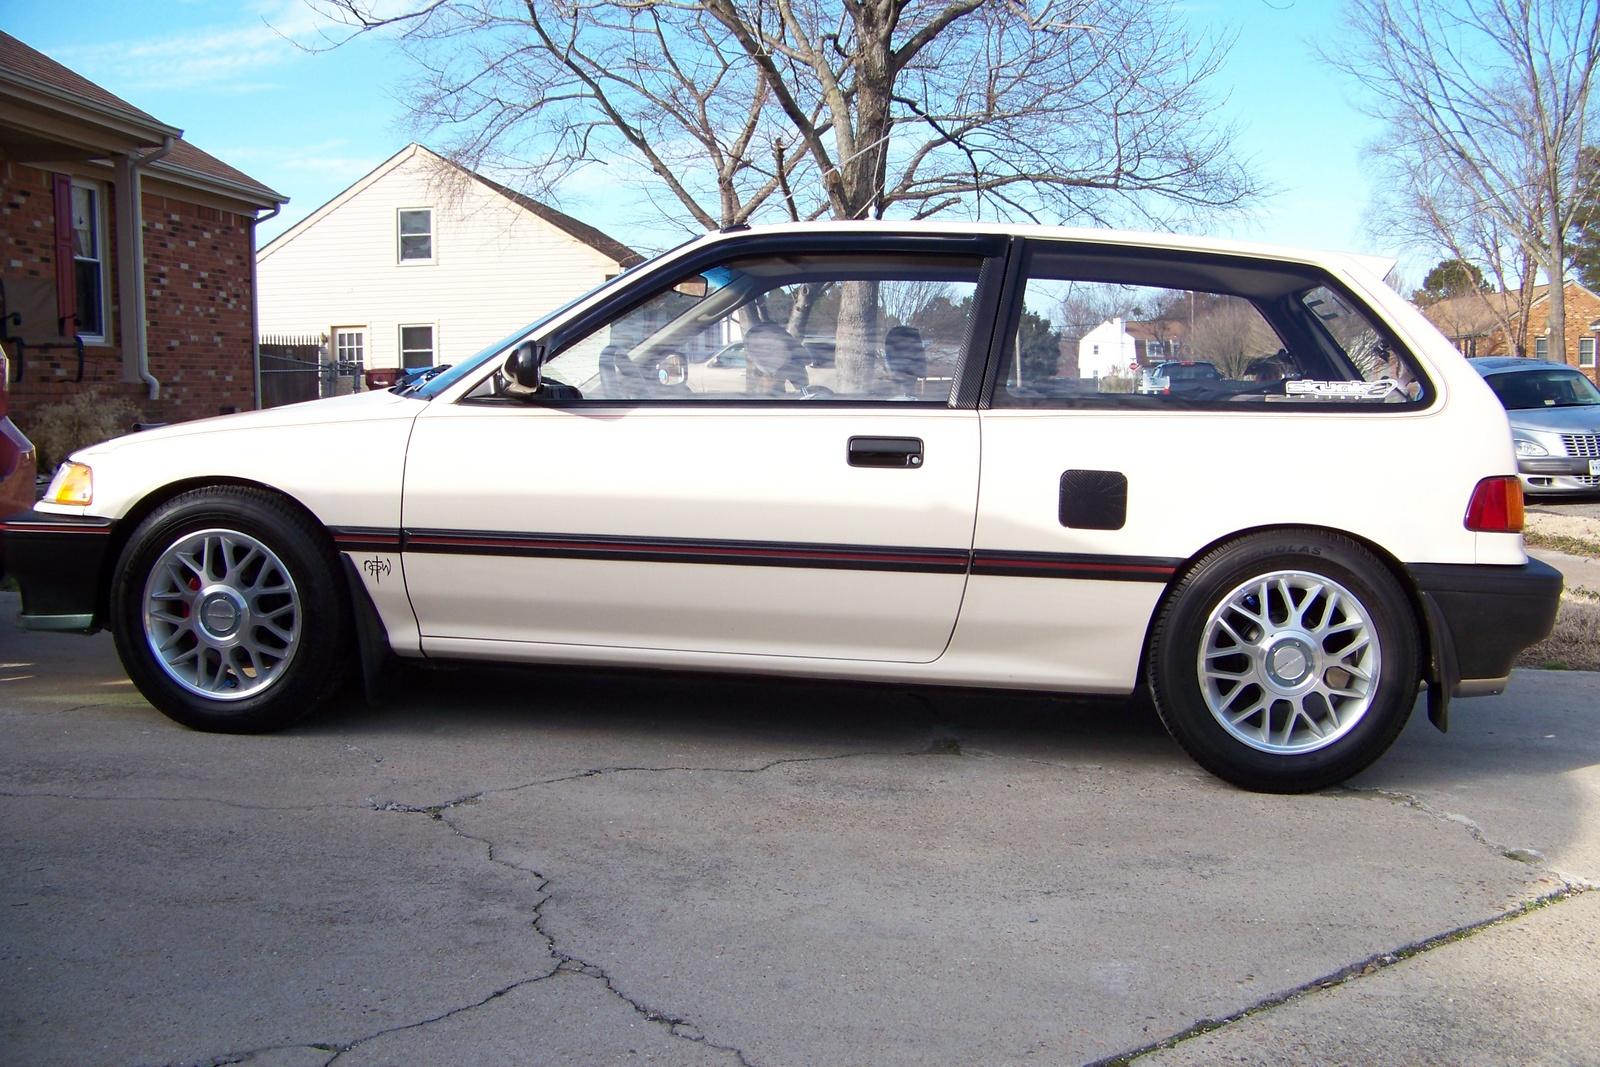 1985 honda civic crx user reviews cargurus autos post for Honda civic 1988